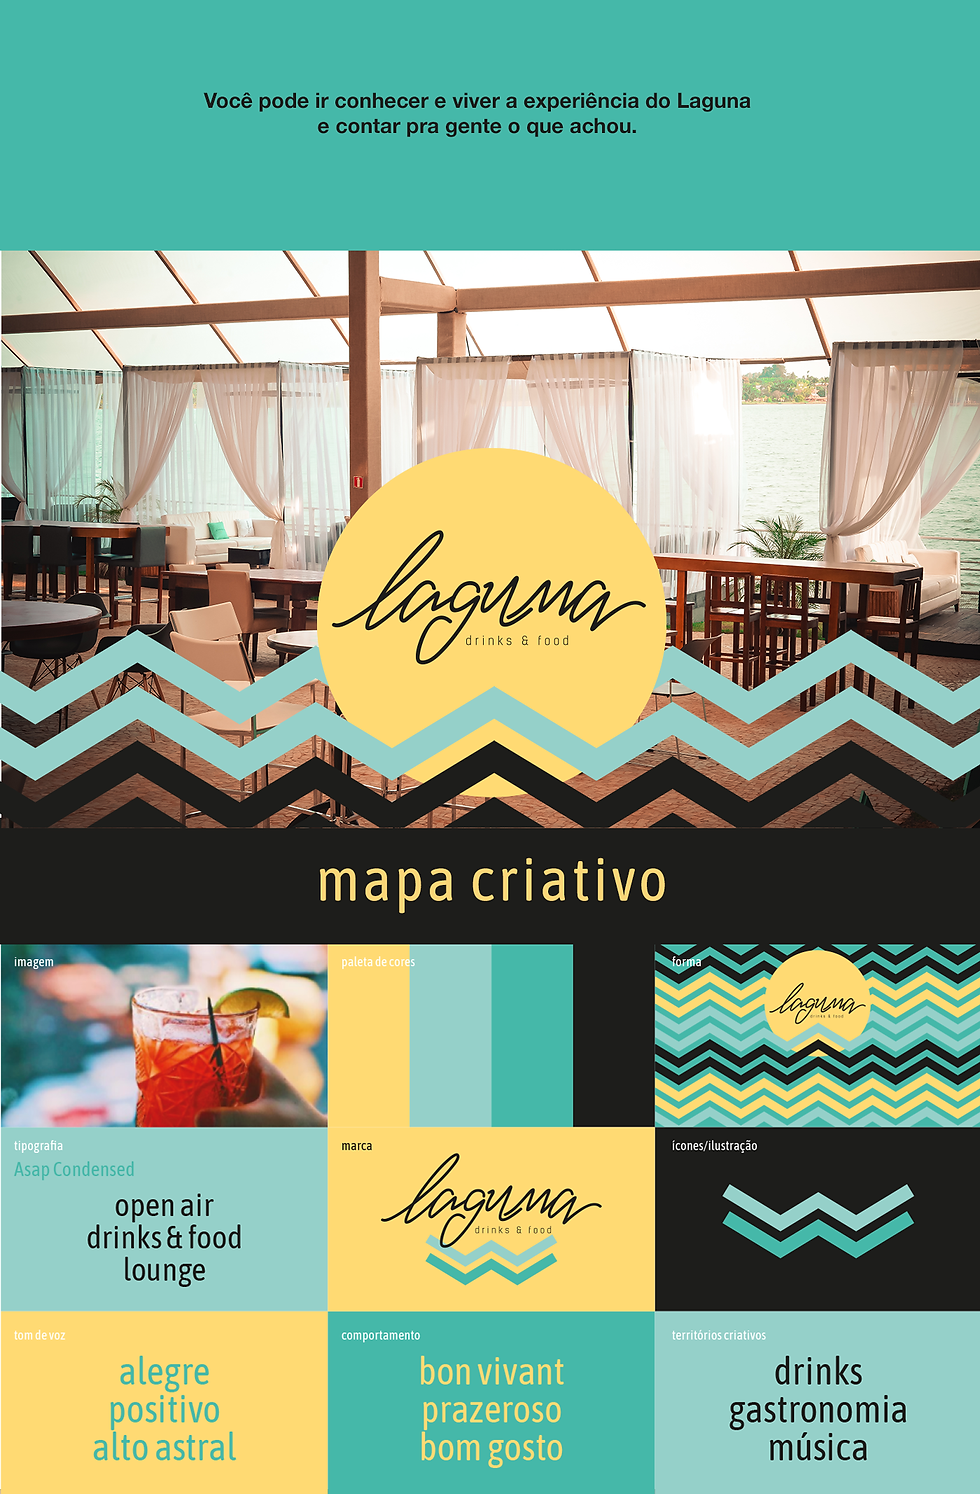 cpsl_005-laguna 10 2.png